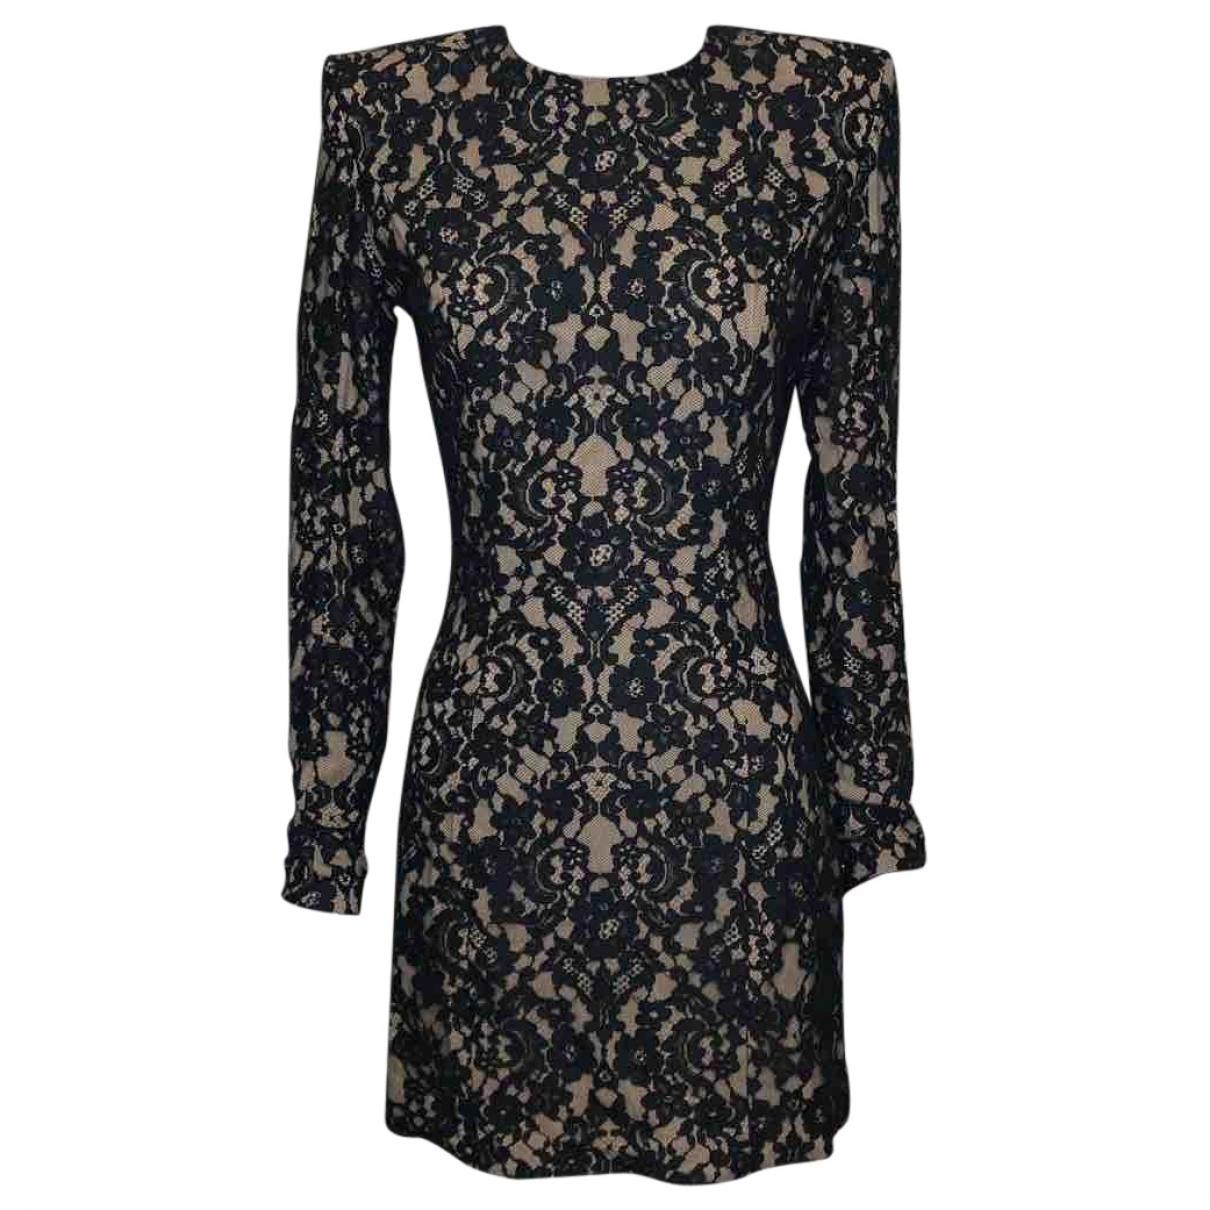 Balmain \N Kleid in  Schwarz Baumwolle